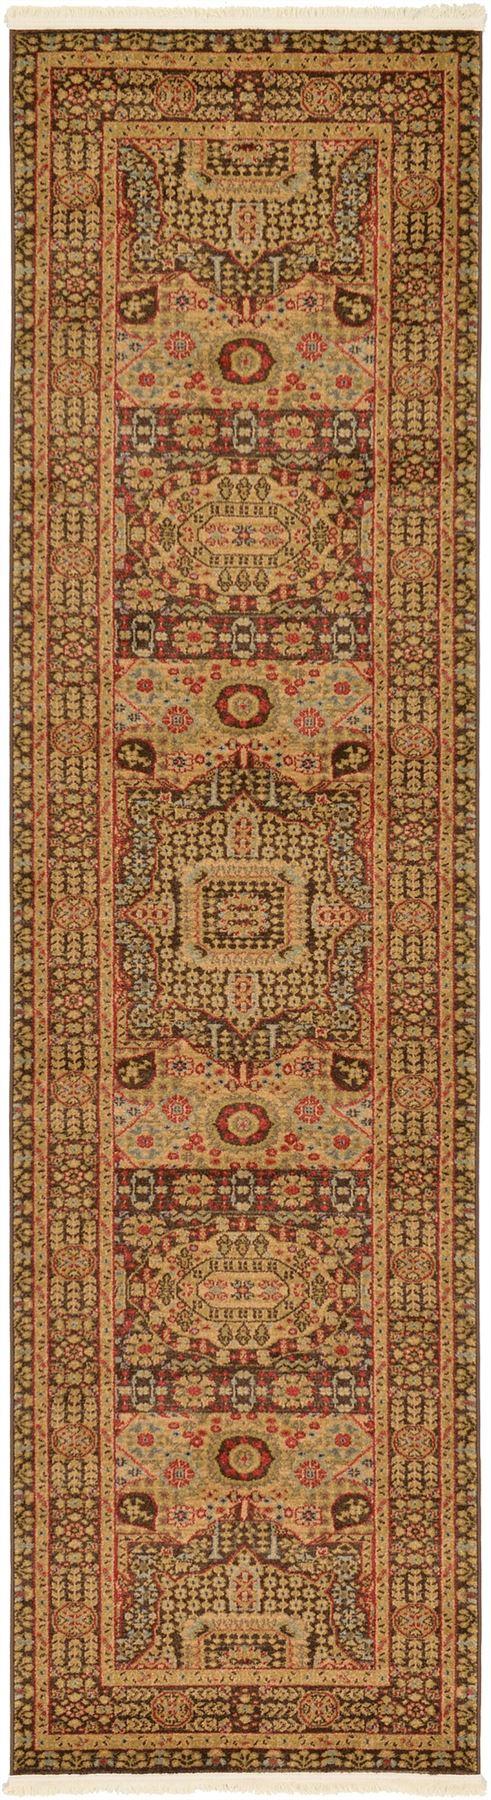 brown wool contemporary handmade rug area floral modern rugs beautiful